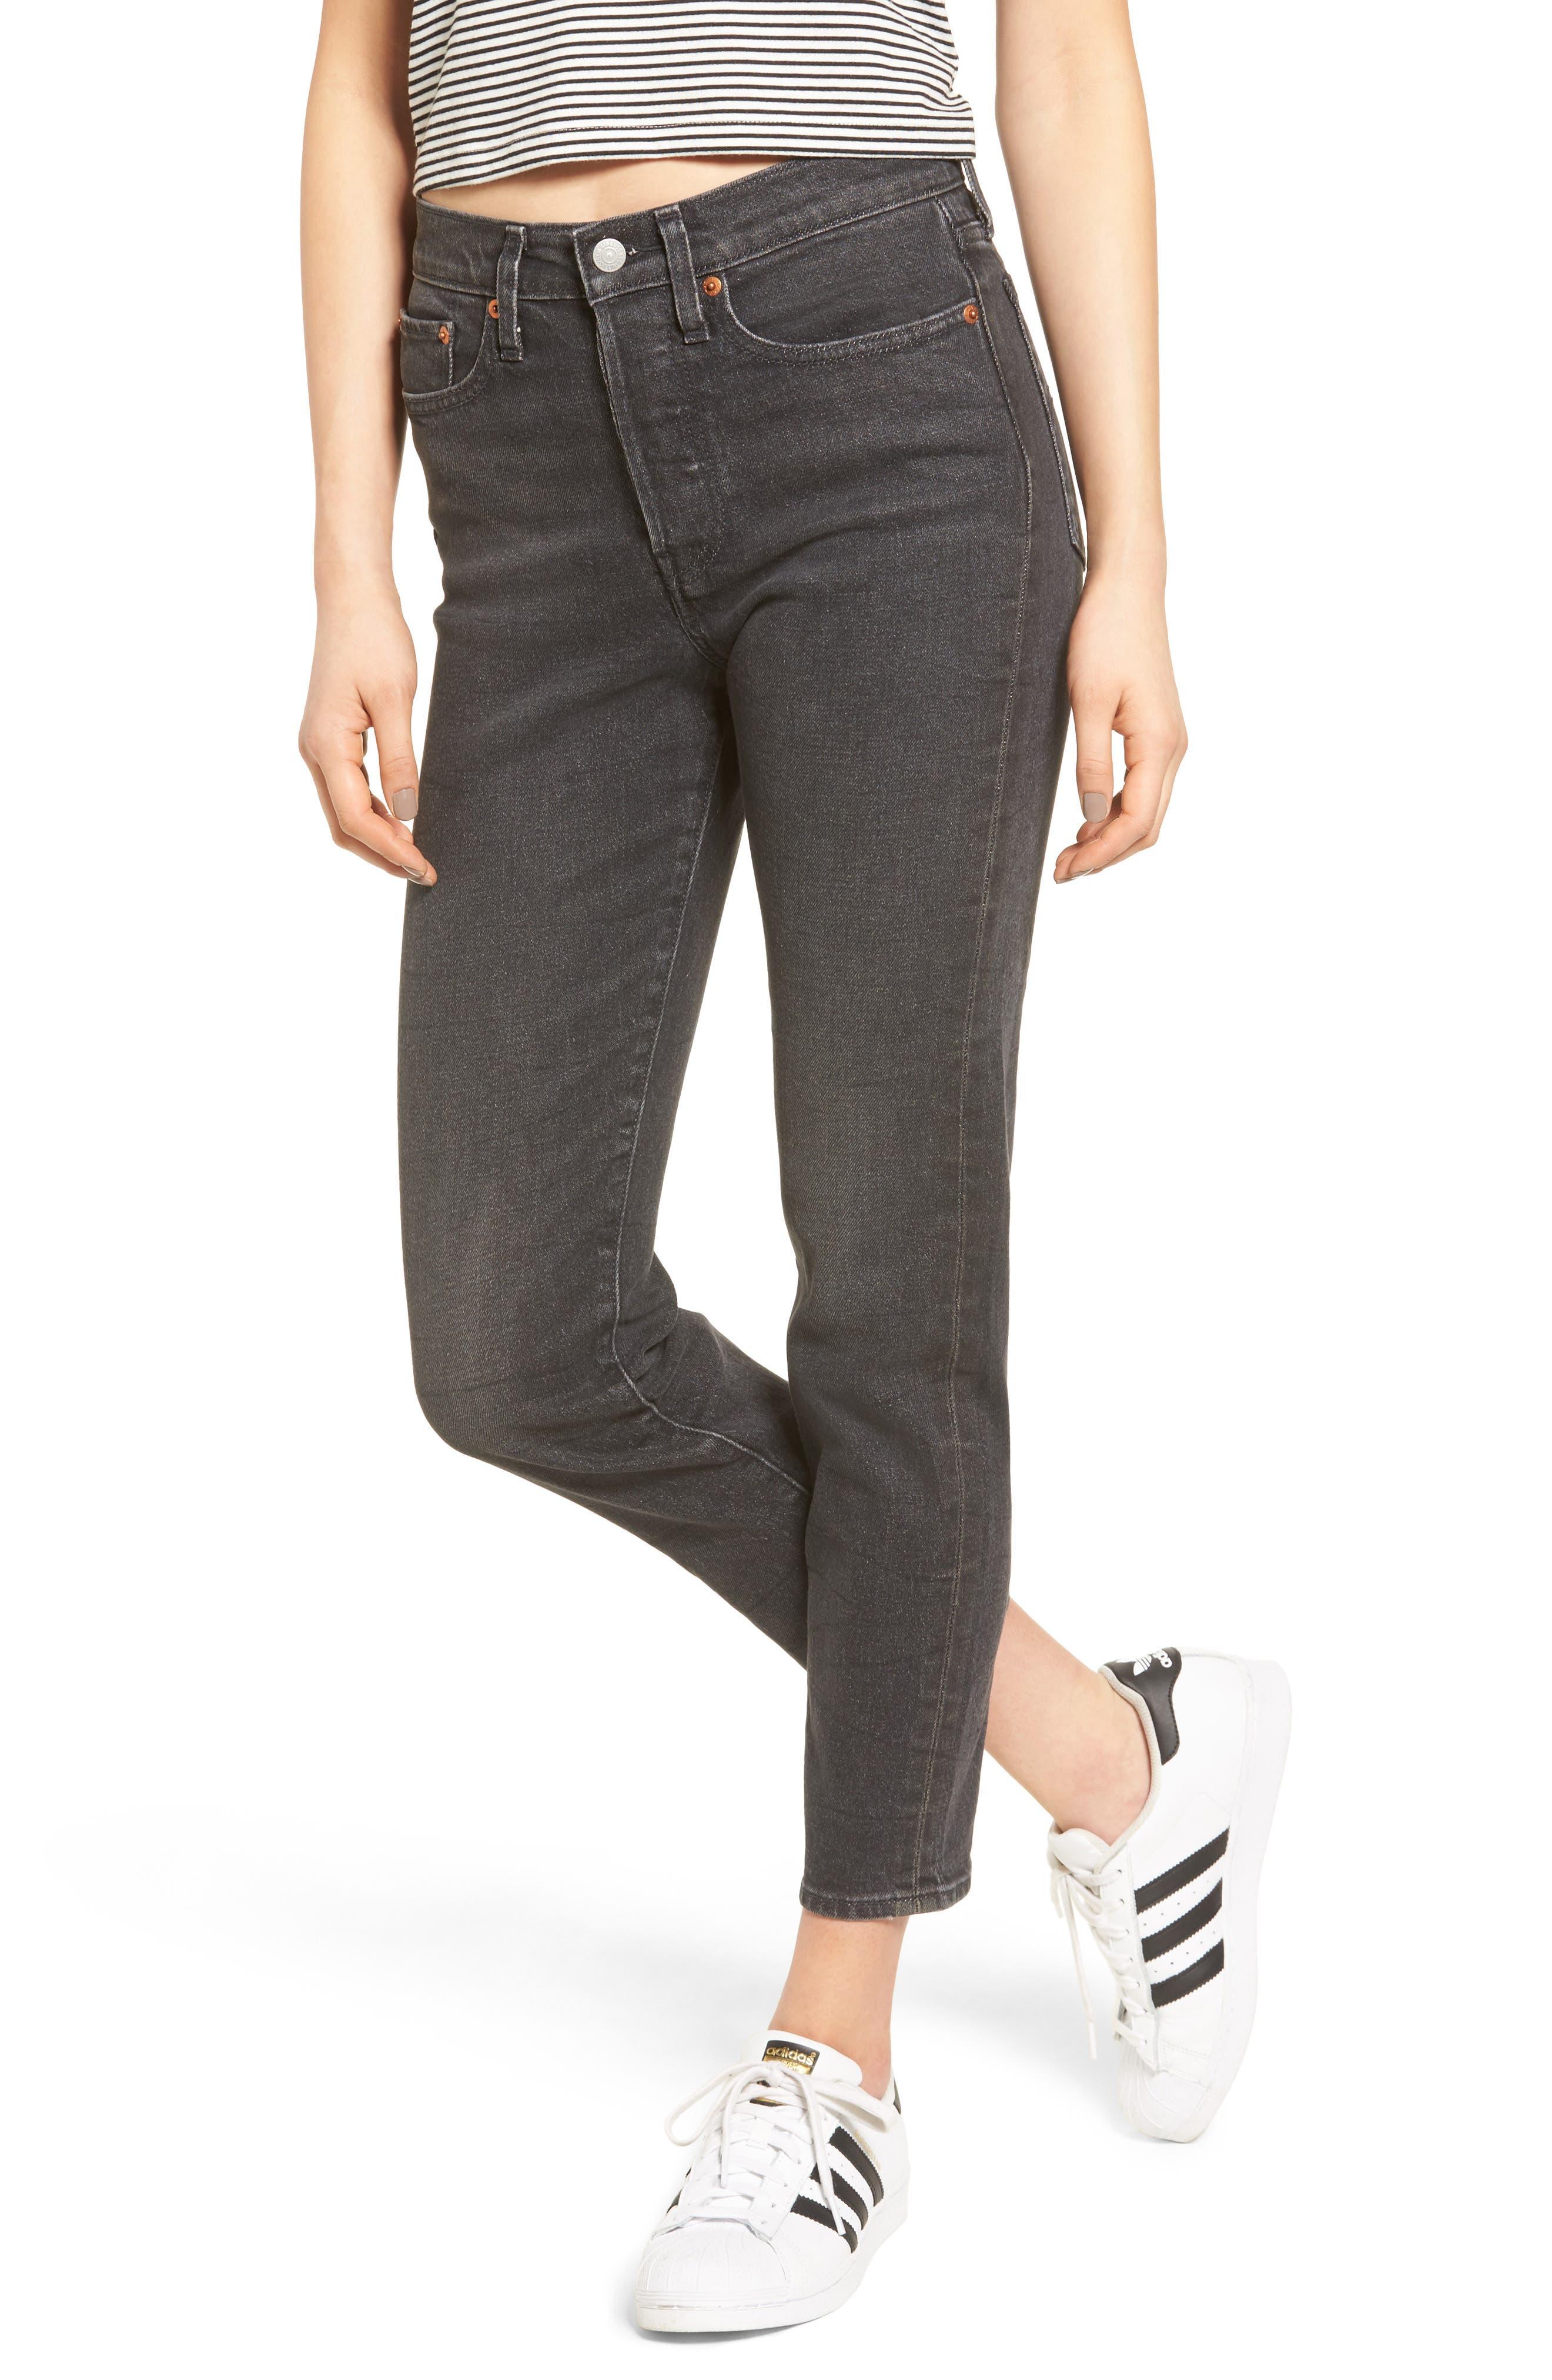 Main Image - Levi's® Wedgie Icon Fit High Waist Crop Jeans (Deedee)